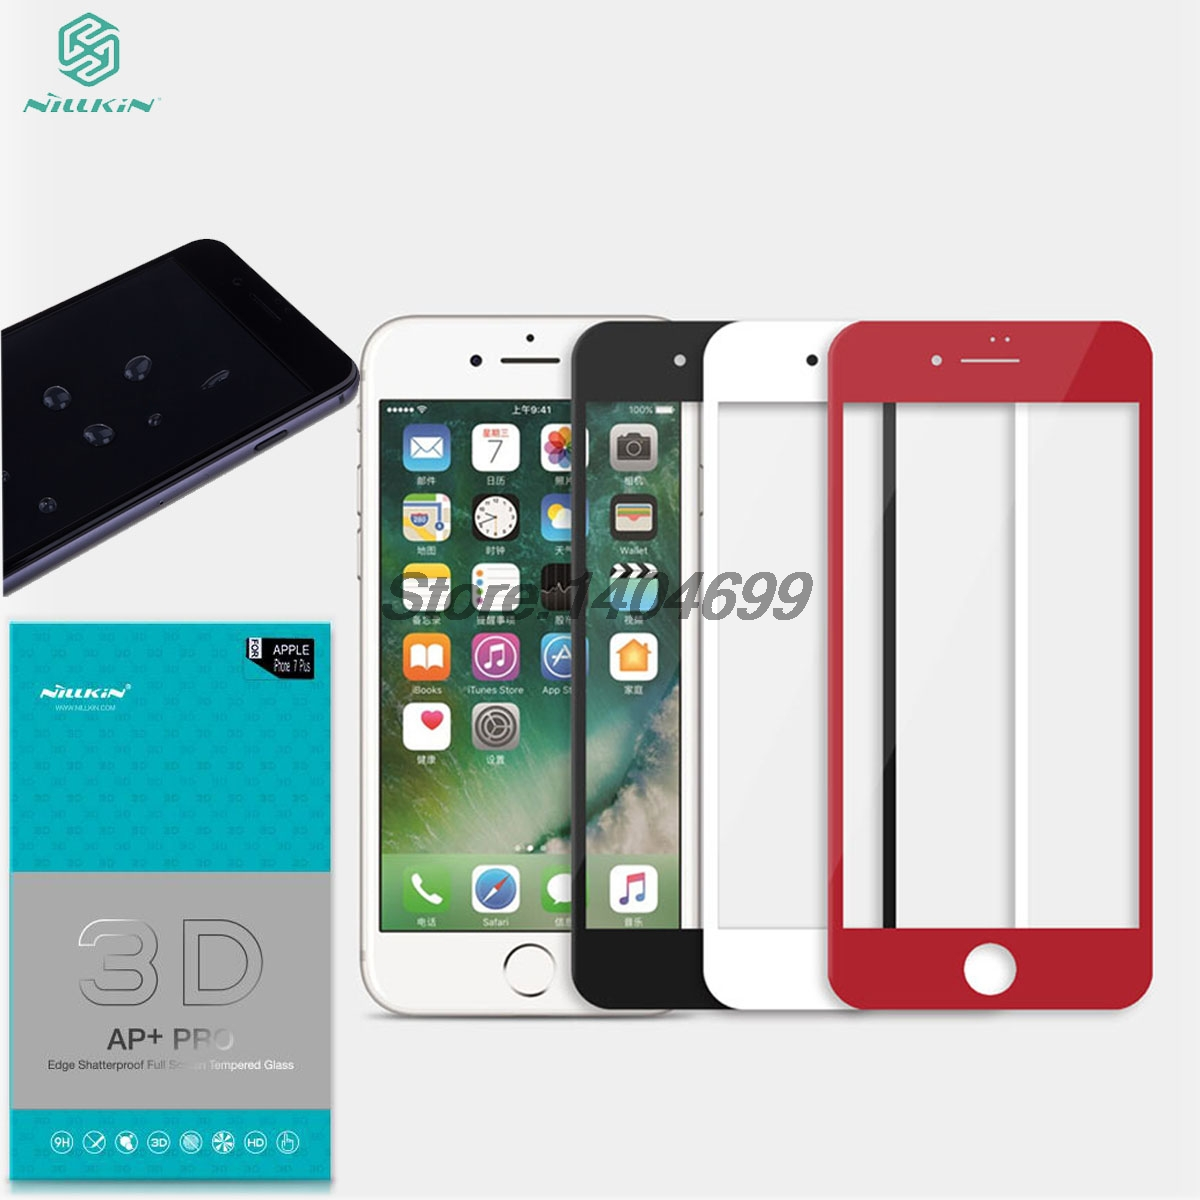 SFor Apple iPhone 7/8 Plus Gehärtetem Glas 5,5 zoll Nillkin 3D AP + PRO Hafenpersenning Schirmschutz Für iPhone 7/8 4,7 zoll